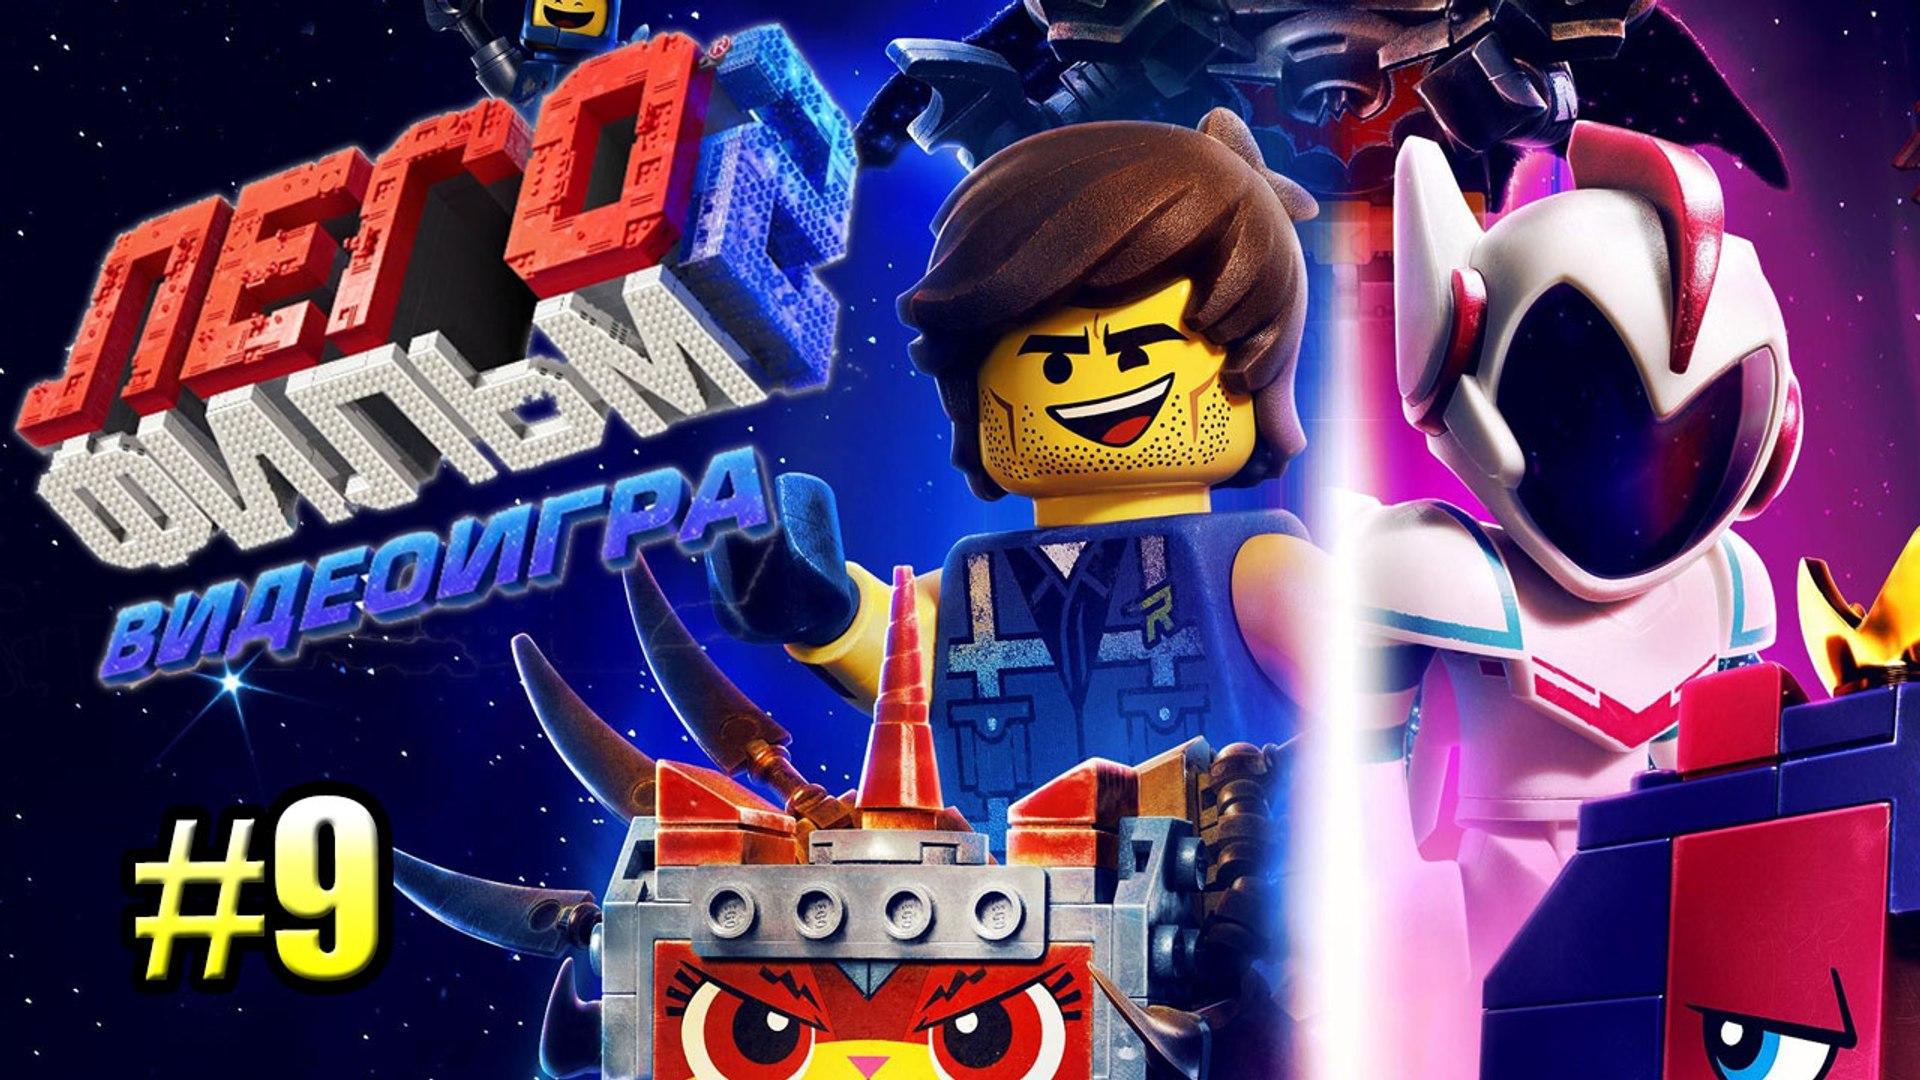 The LEGO Movie 2 Videogame прохождение #9 на русском {PC}